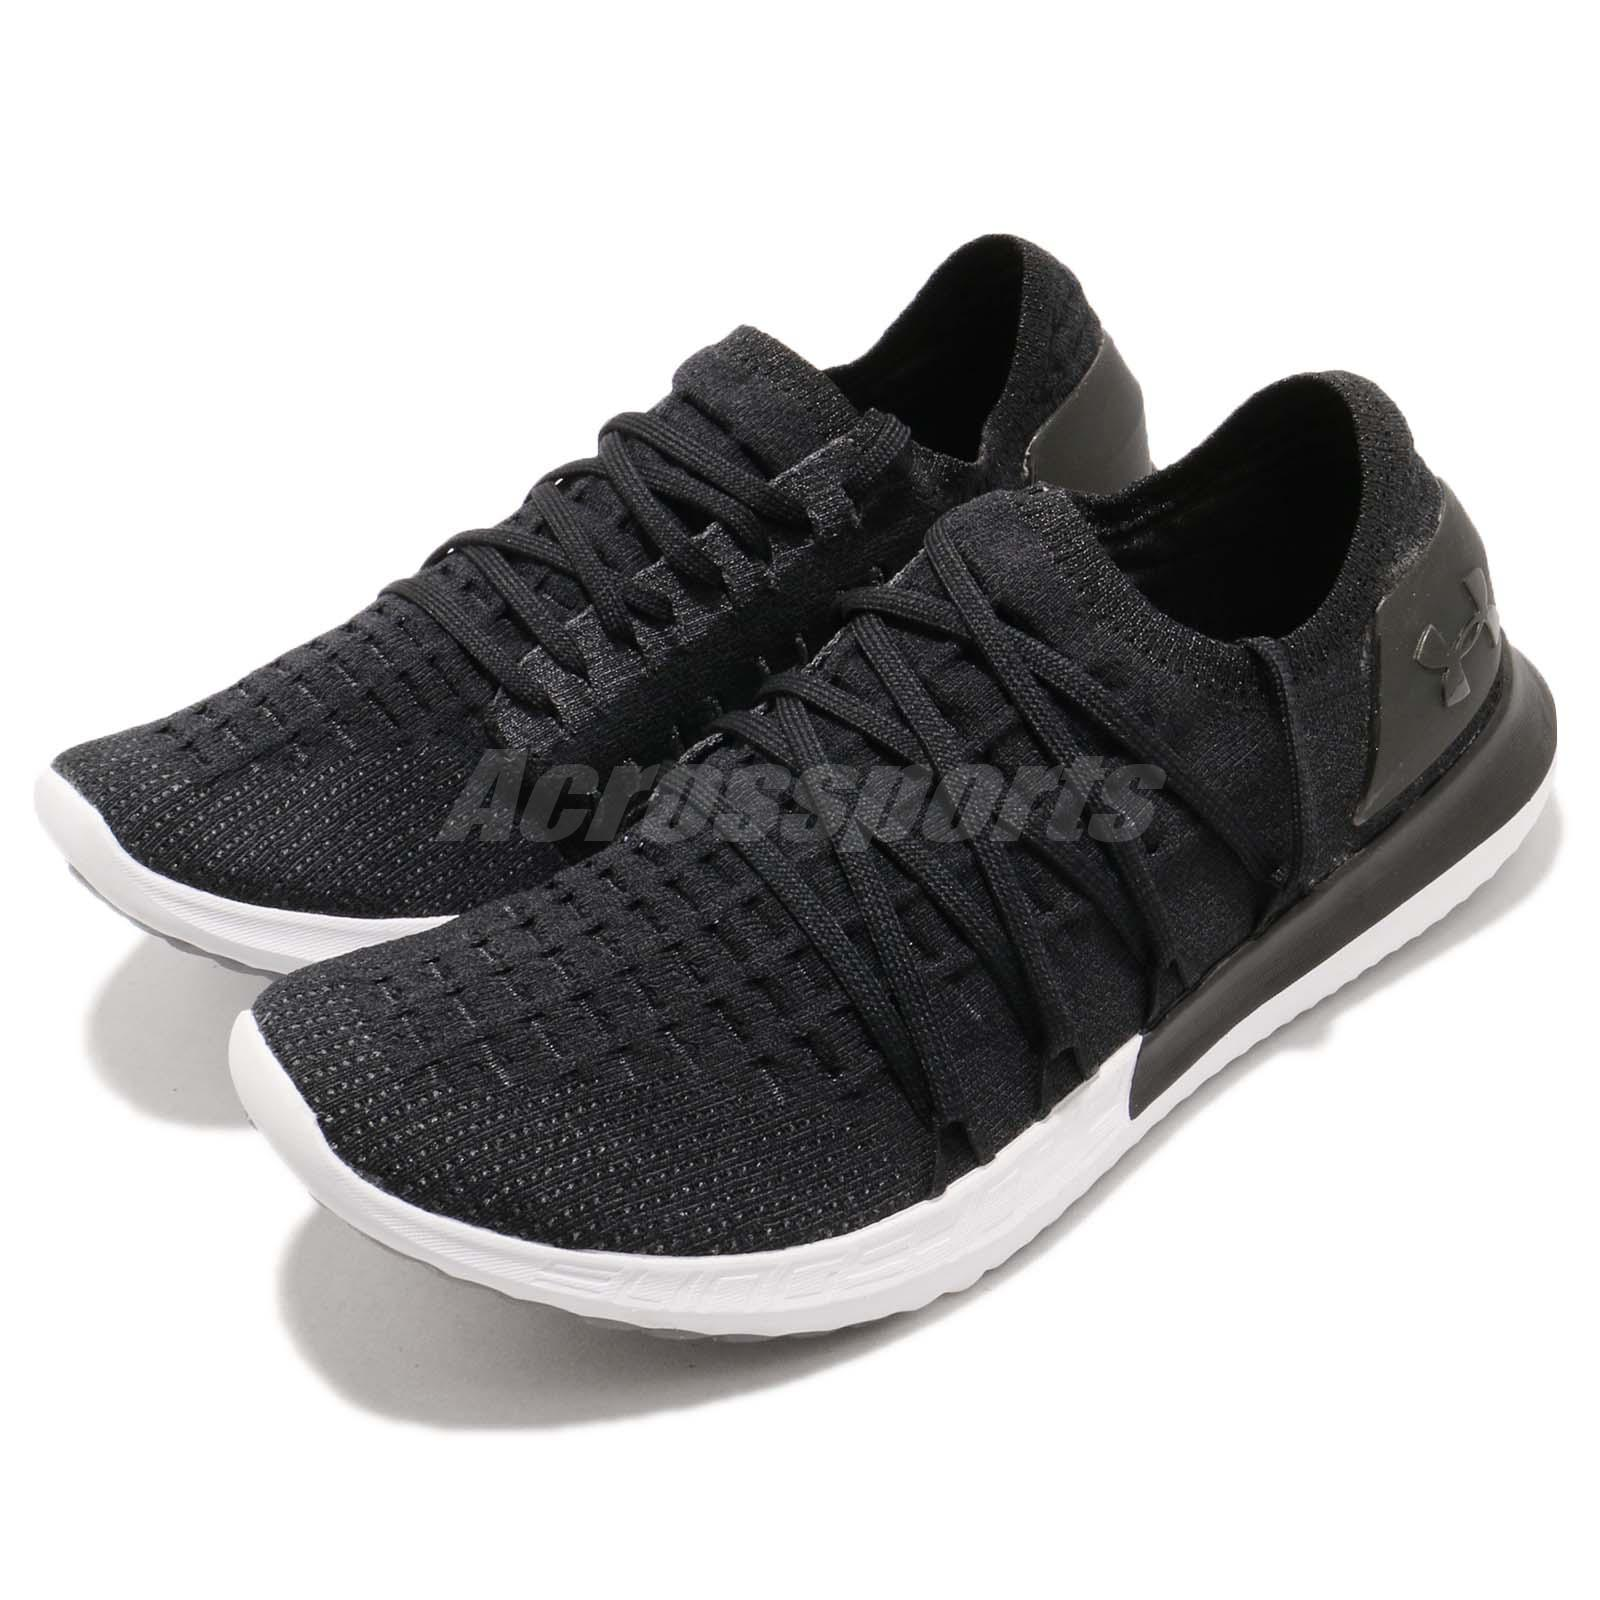 Under Armour Men/'s Speedform Slingshot 2 Running Shoes 3000007 001 Black